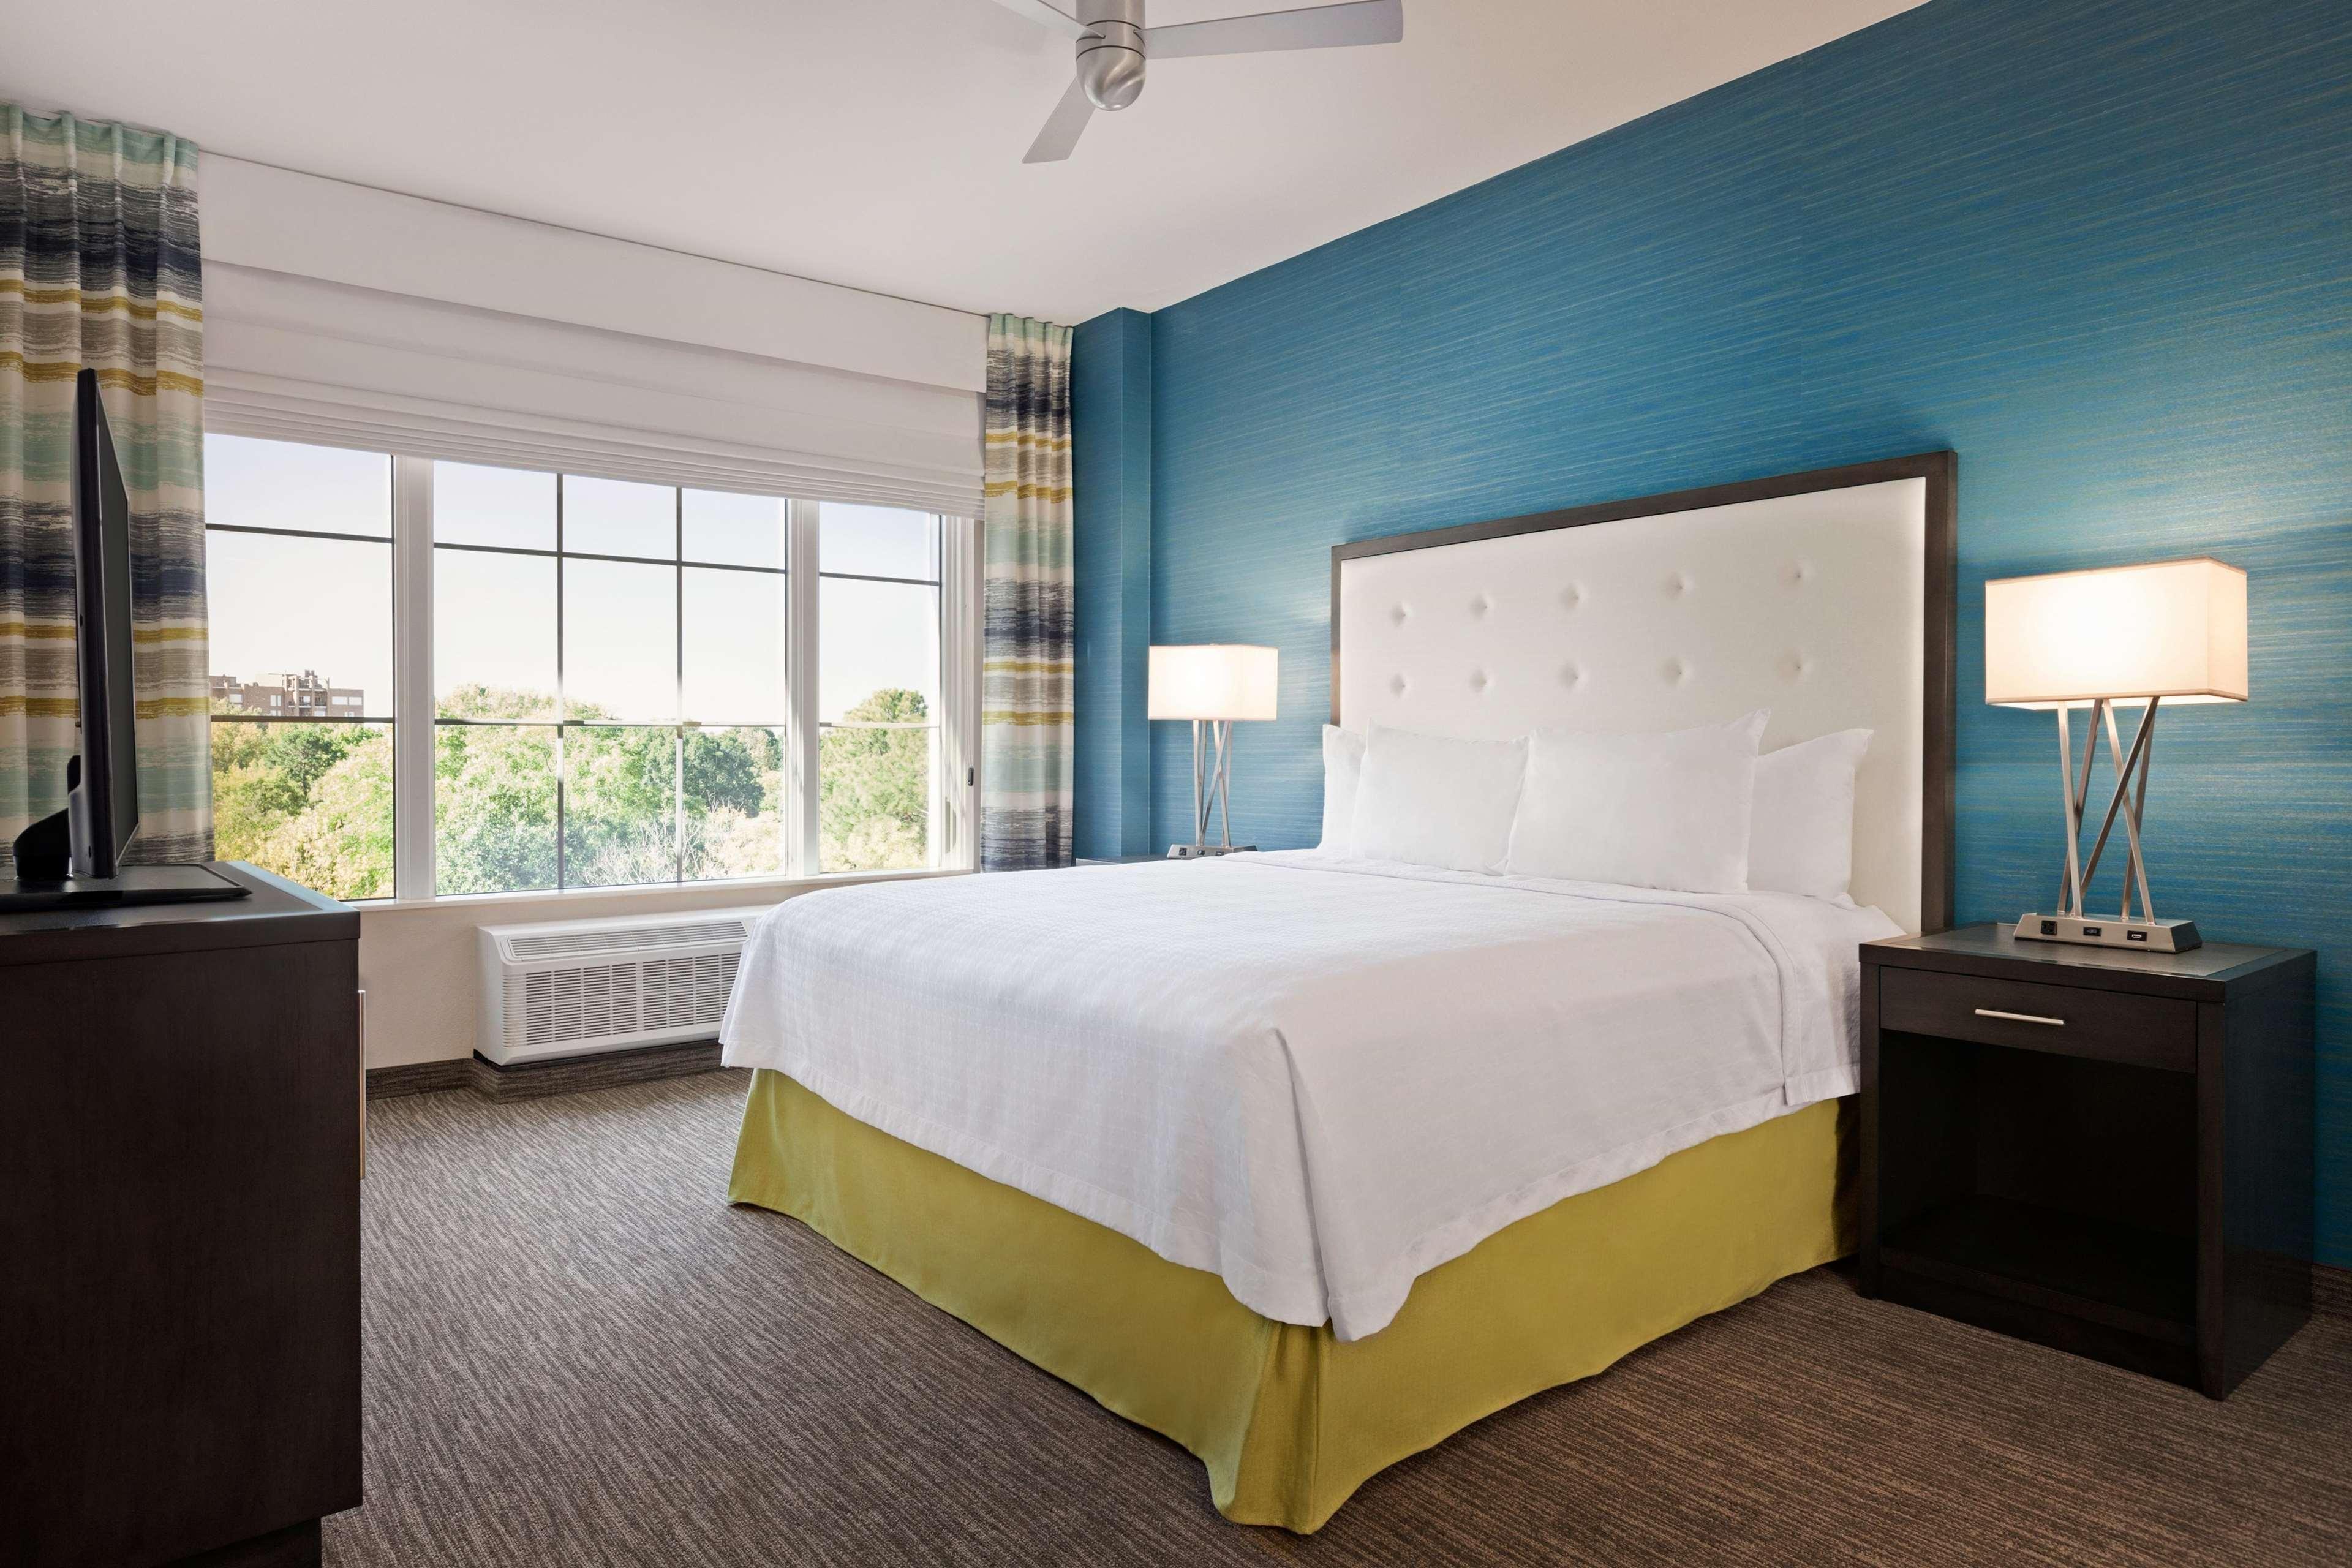 Homewood Suites by Hilton Charlotte/SouthPark image 23